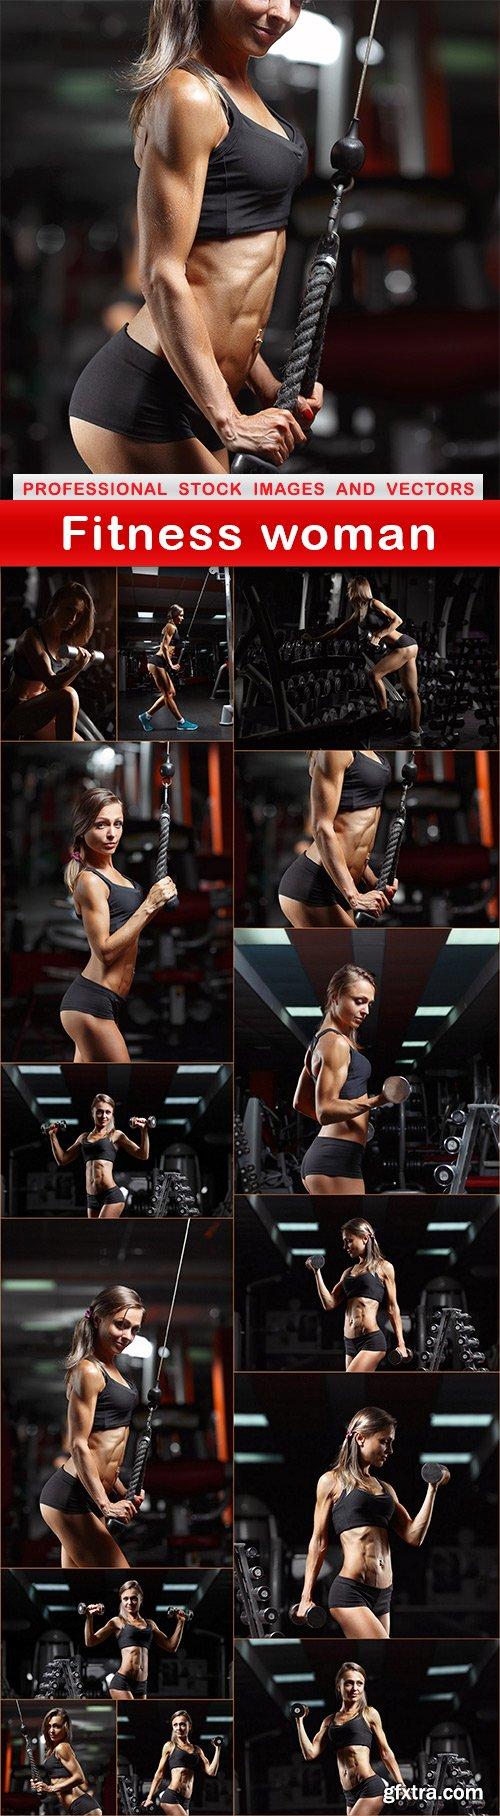 Fitness woman - 15 UHQ JPEG